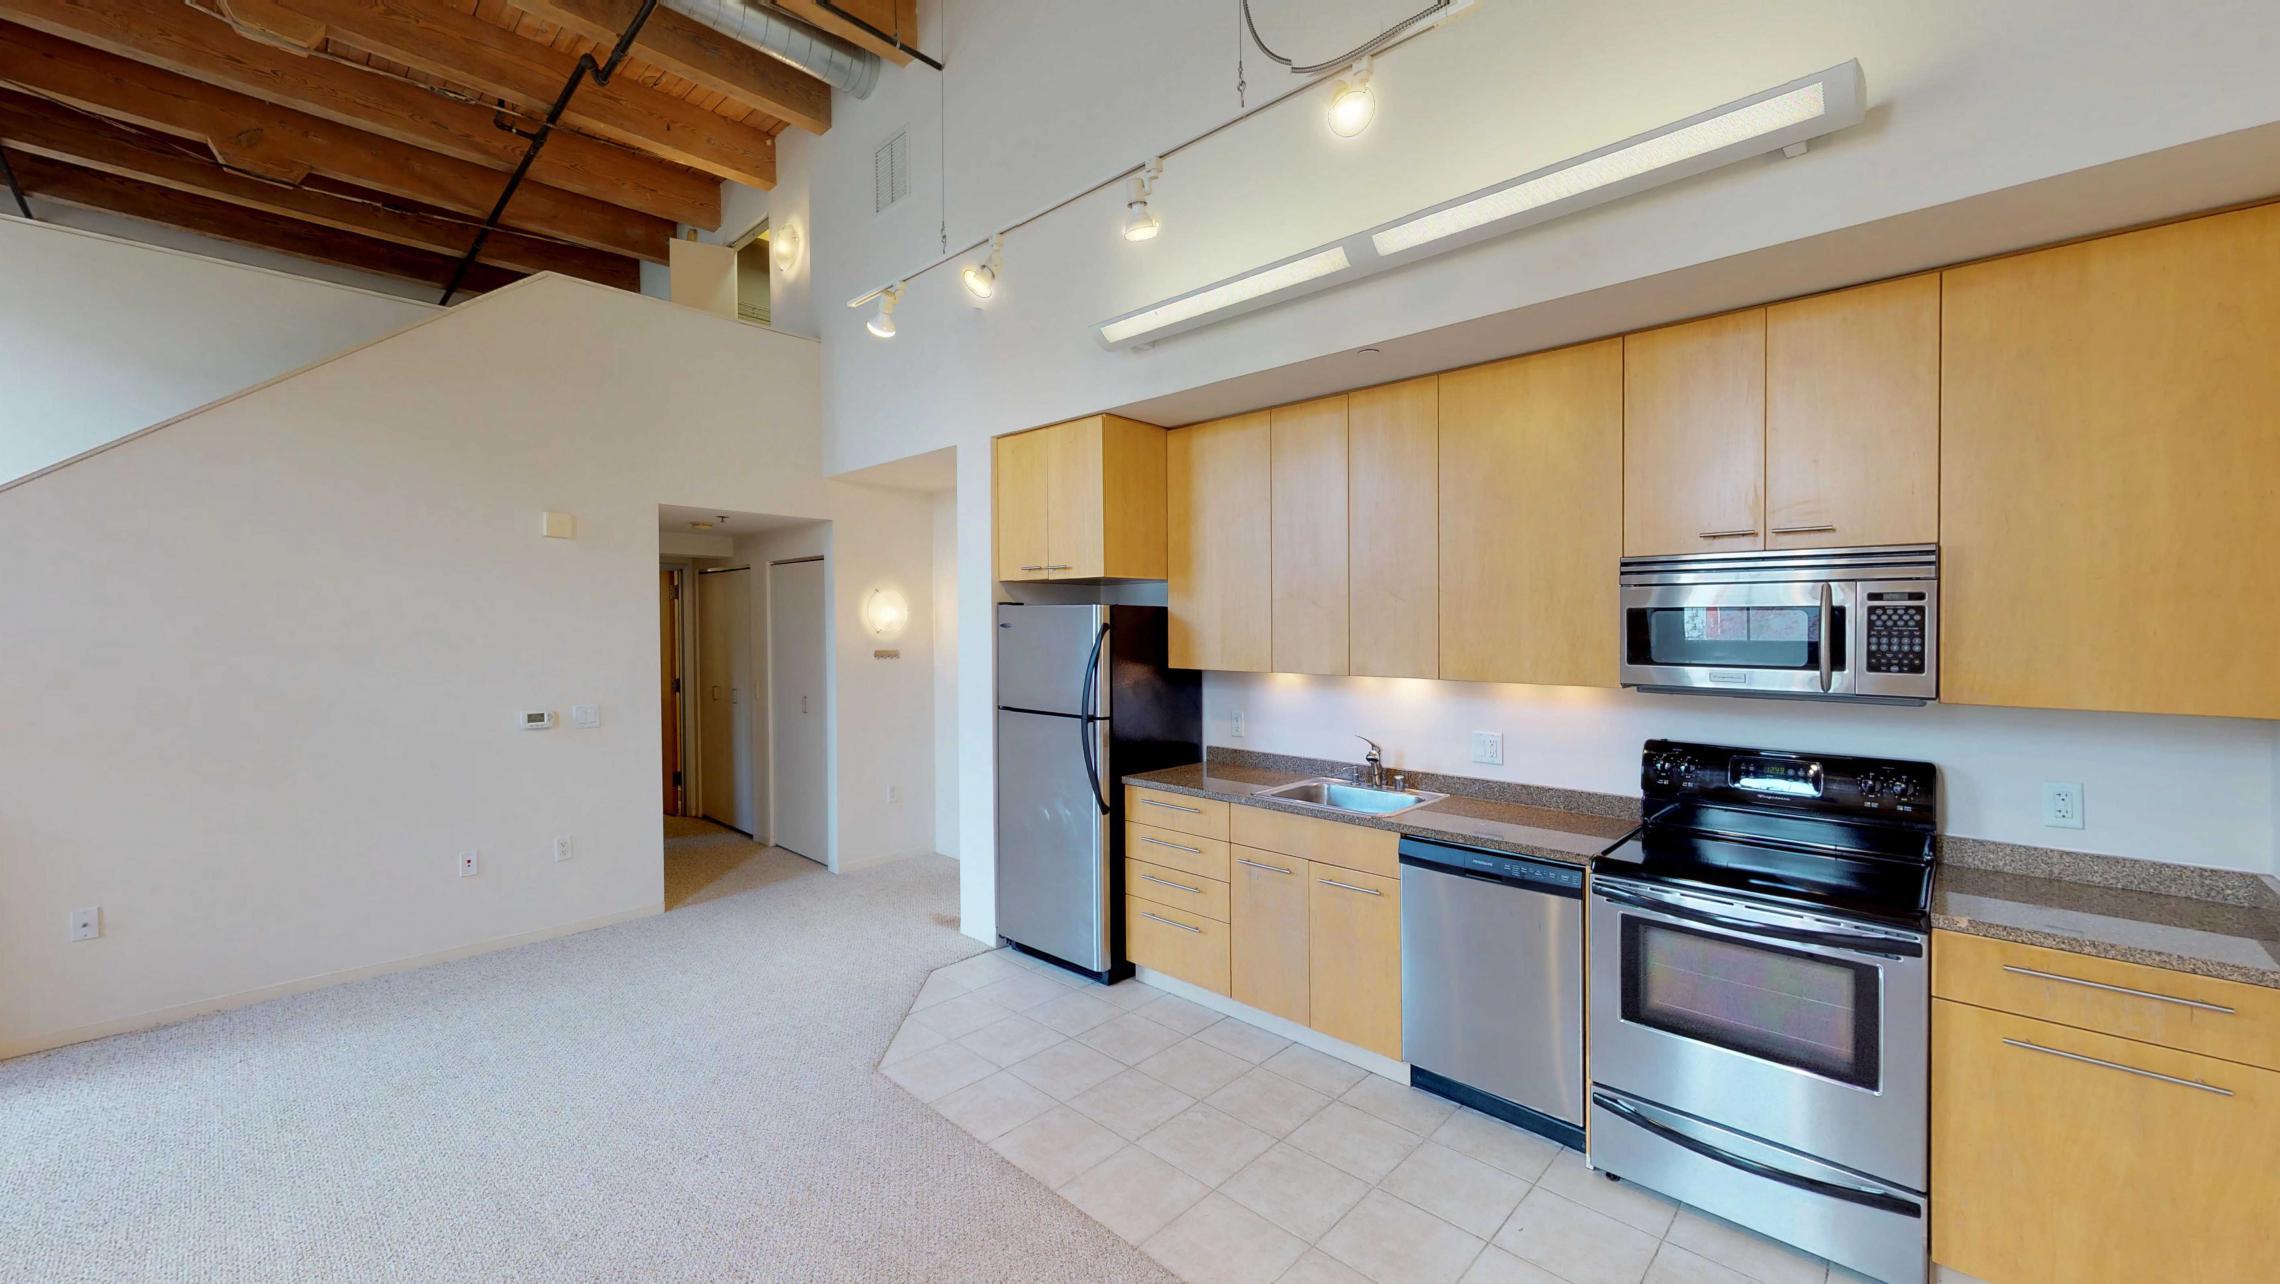 Tobacco-Lofts-E203-lofted-two-bedroom-exposed-brick-upscale-design-historic